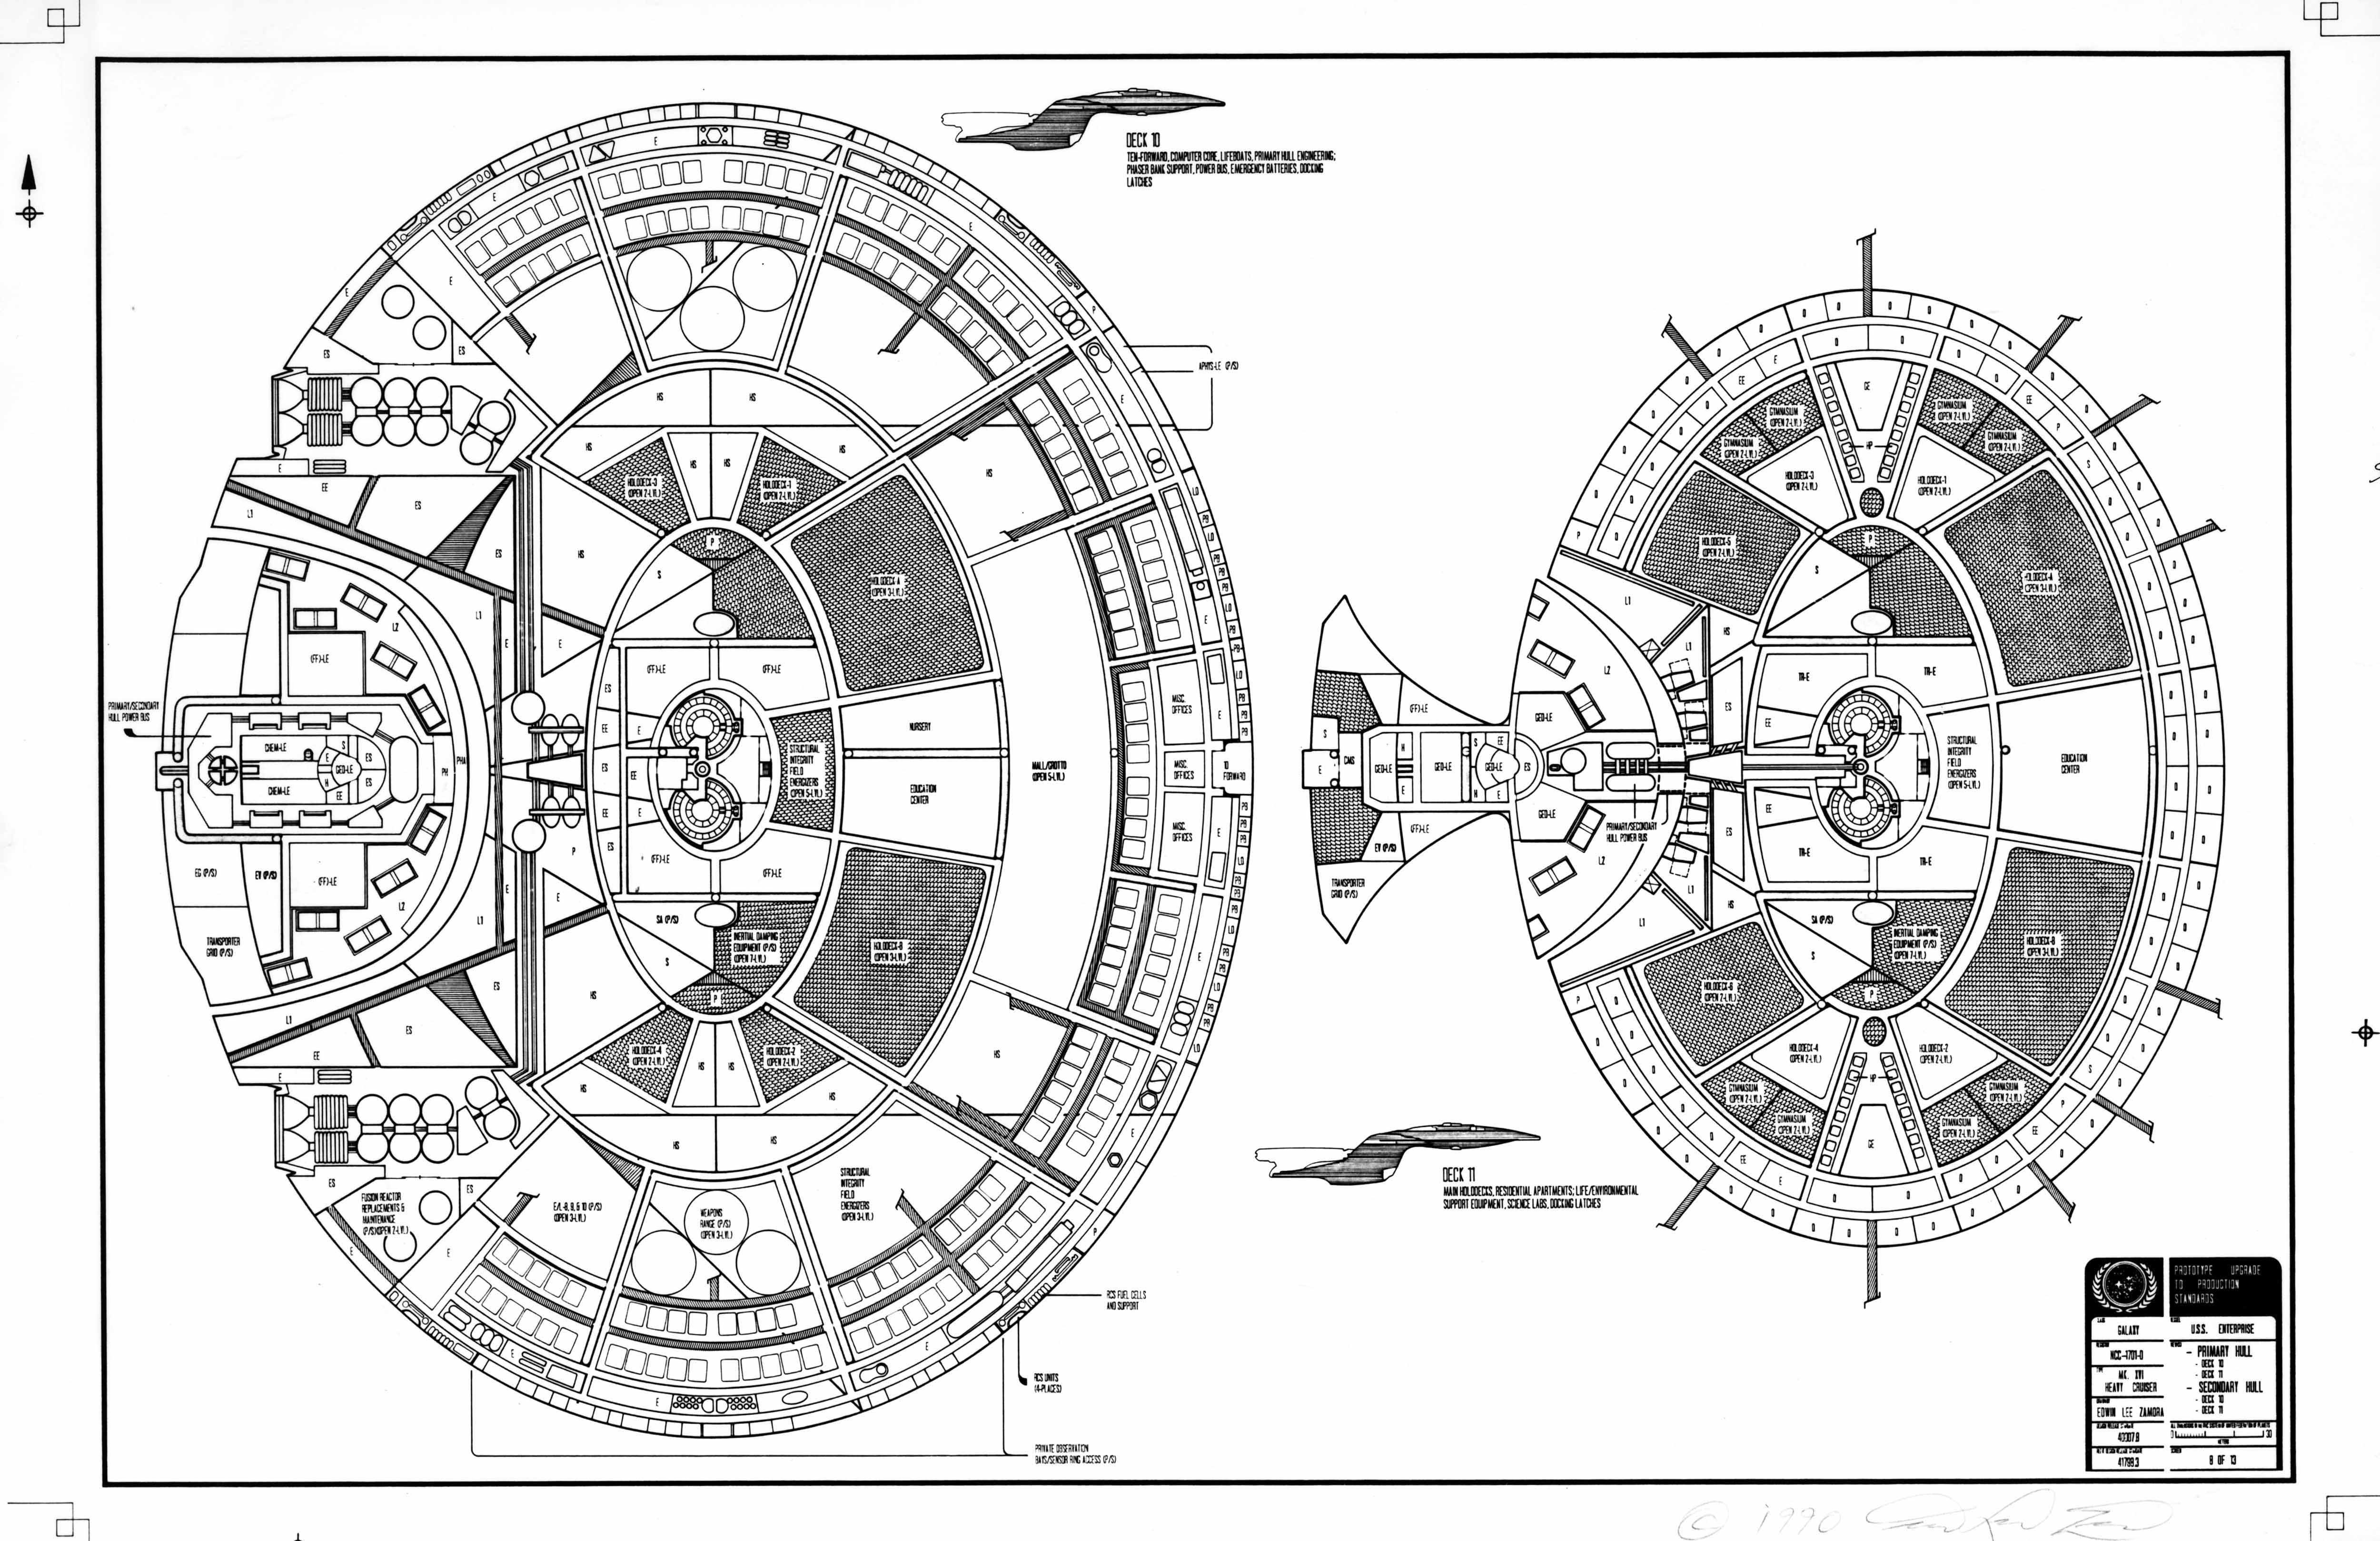 Enterprise D Floor Plan